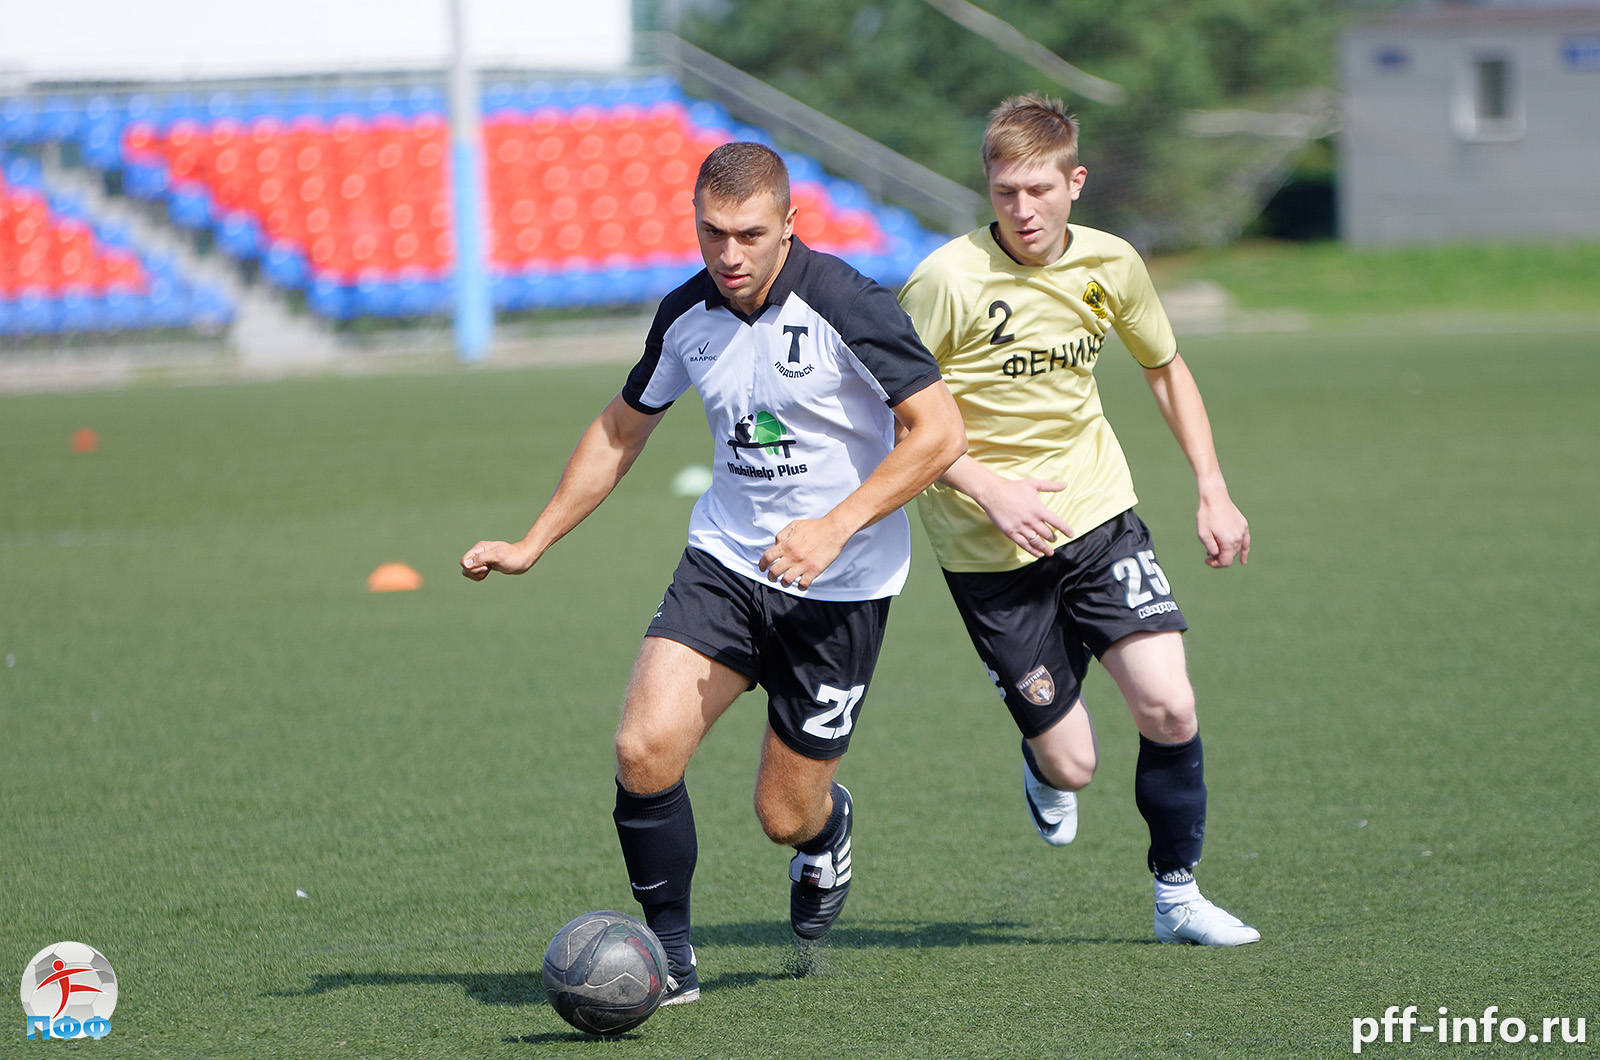 Премьер-лига ТДК. Обзор 15 тура